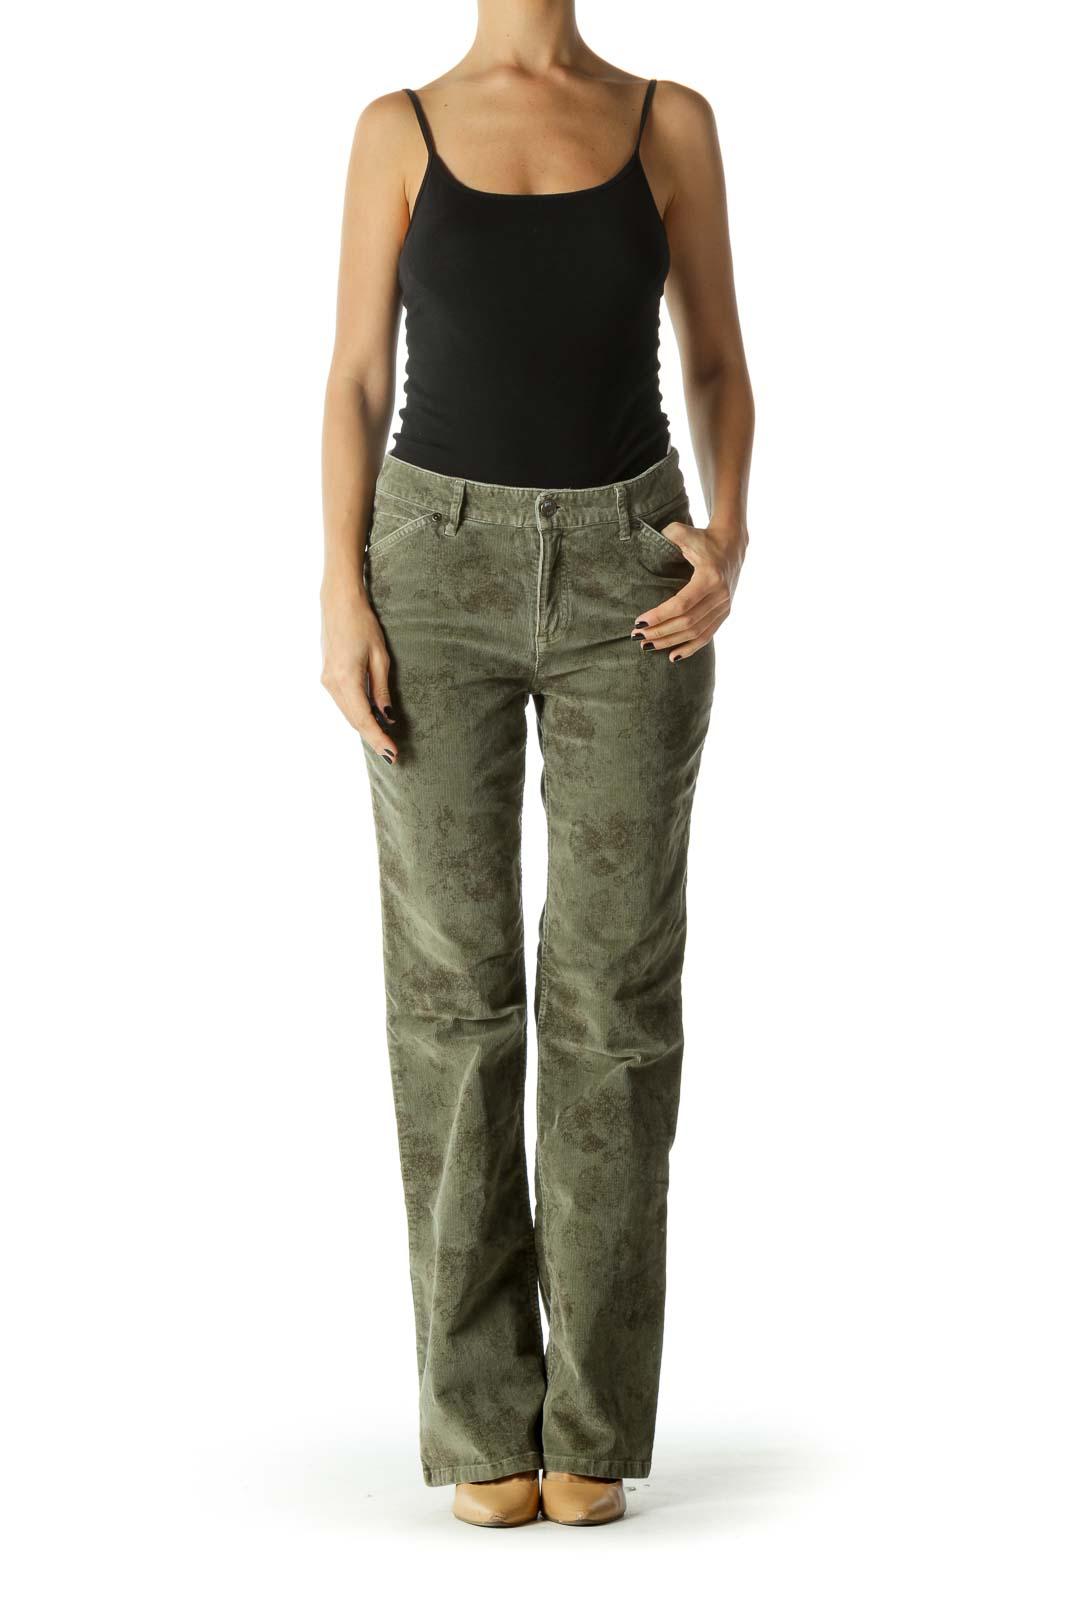 Green Corduroy Mid Rise Floral Print Wide Leg Pants